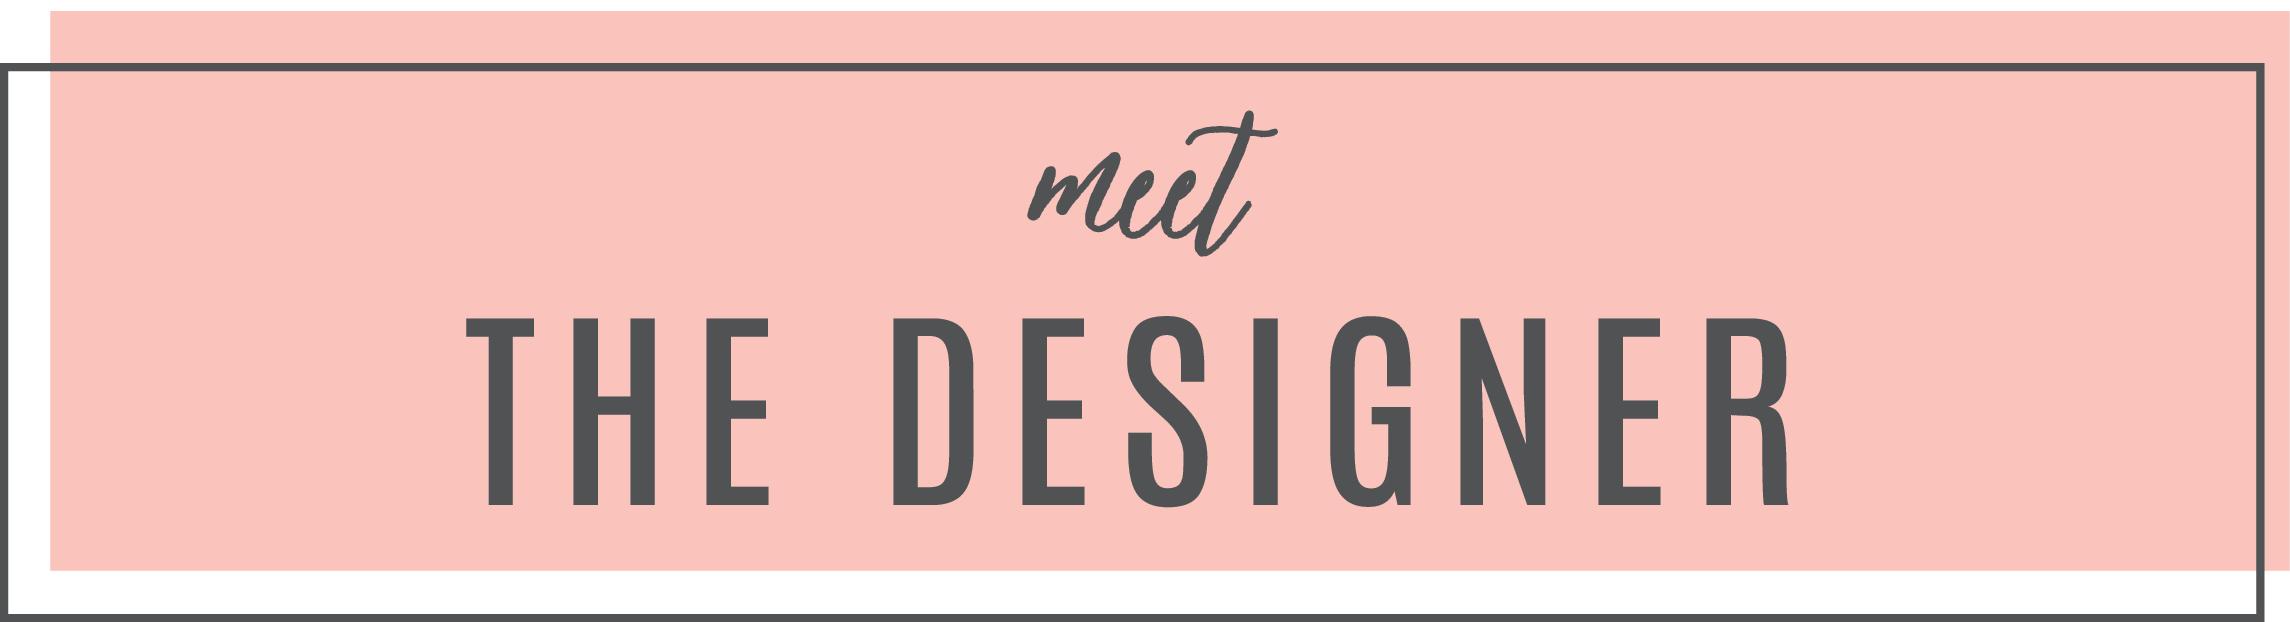 meet the designer icon.jpg